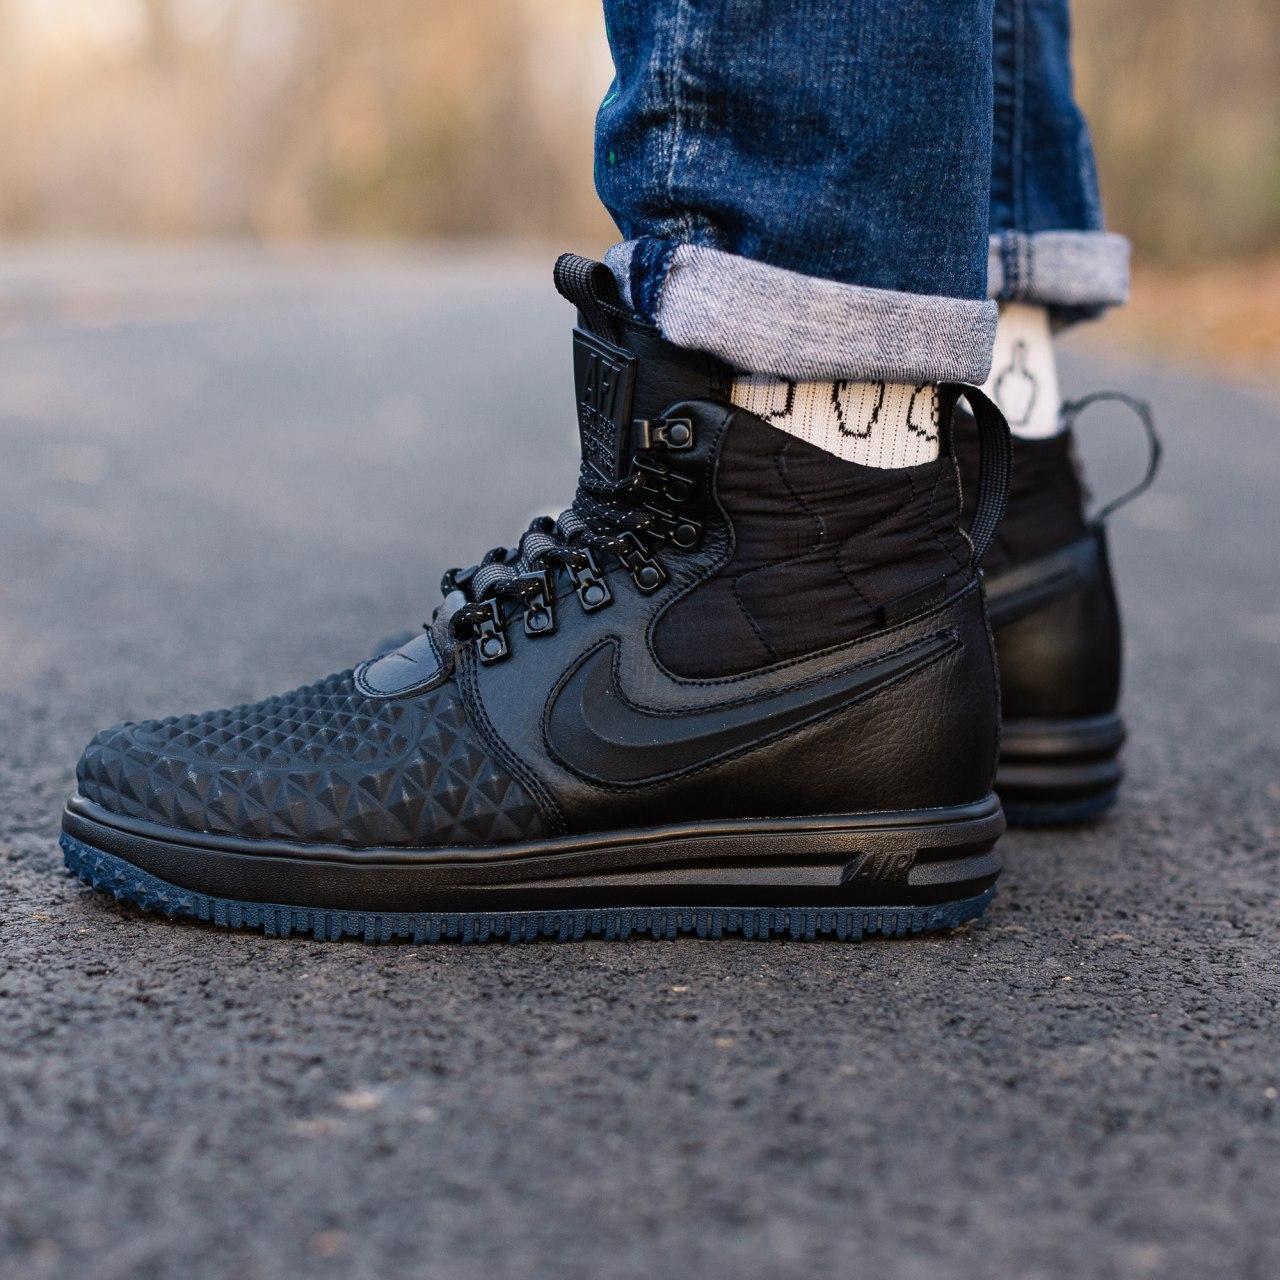 Кроссовки мужские Nike Lunar Force 1 Duckboot 17 black (Реплика ААА)